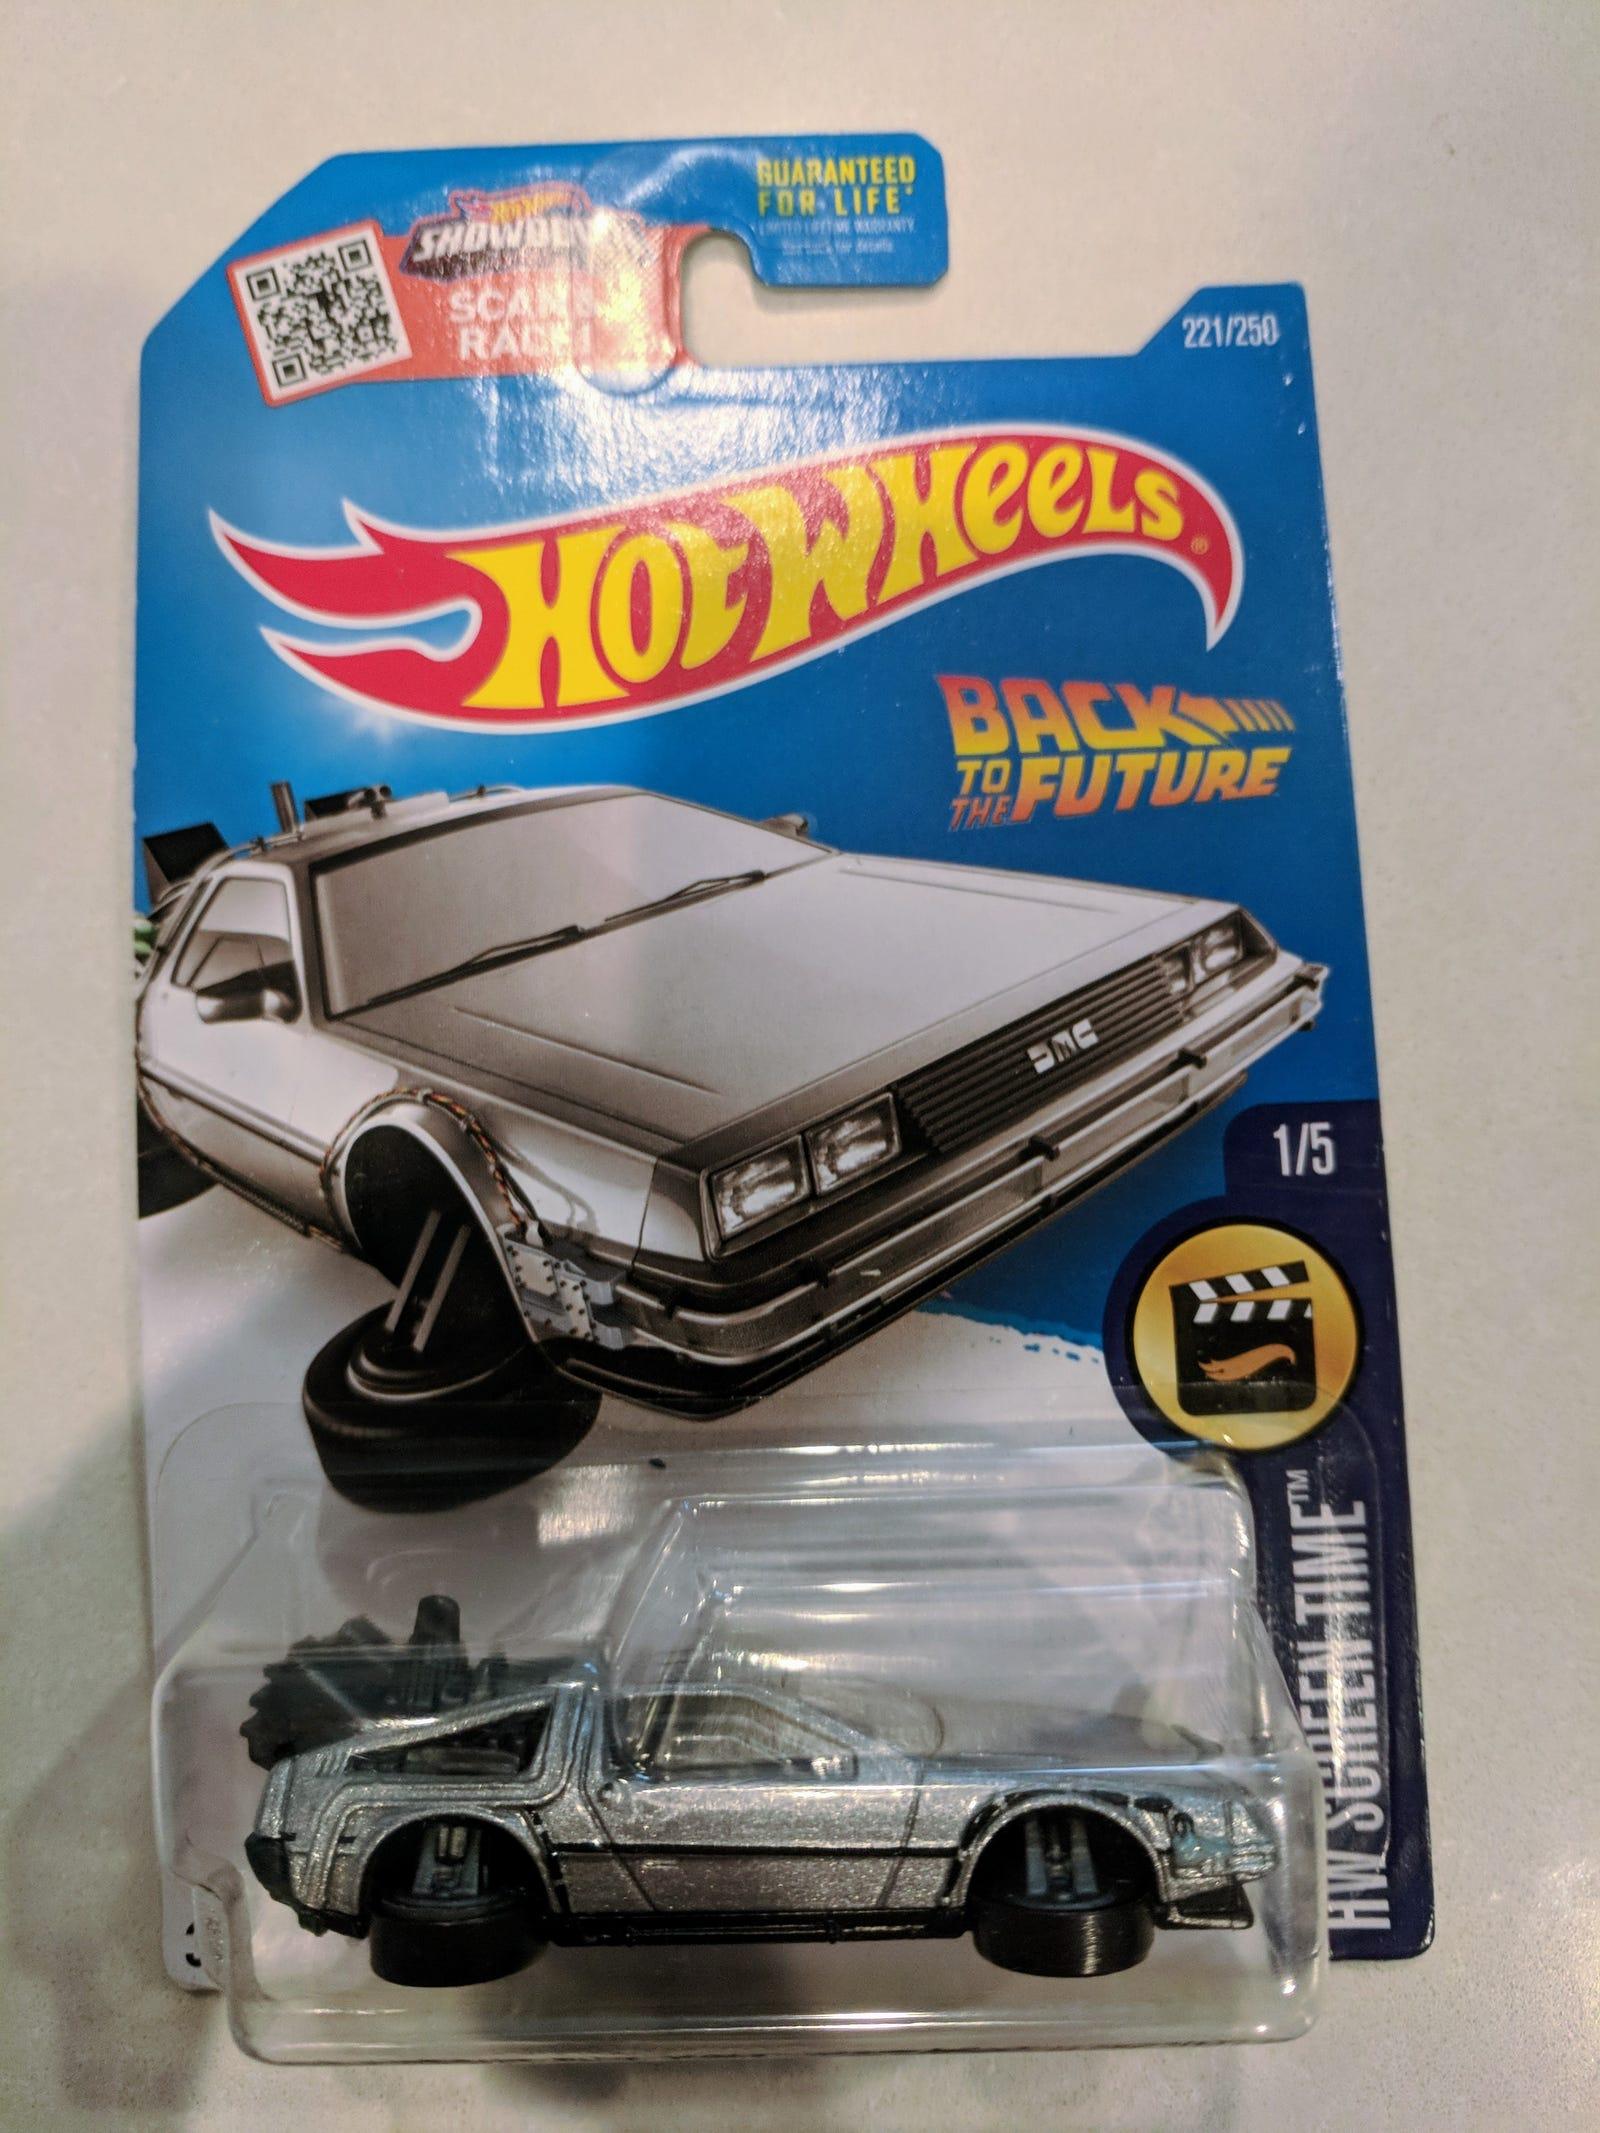 Lot 25: Fantasy Junction: $4 for 7 cars including a hover mode DeLorean...